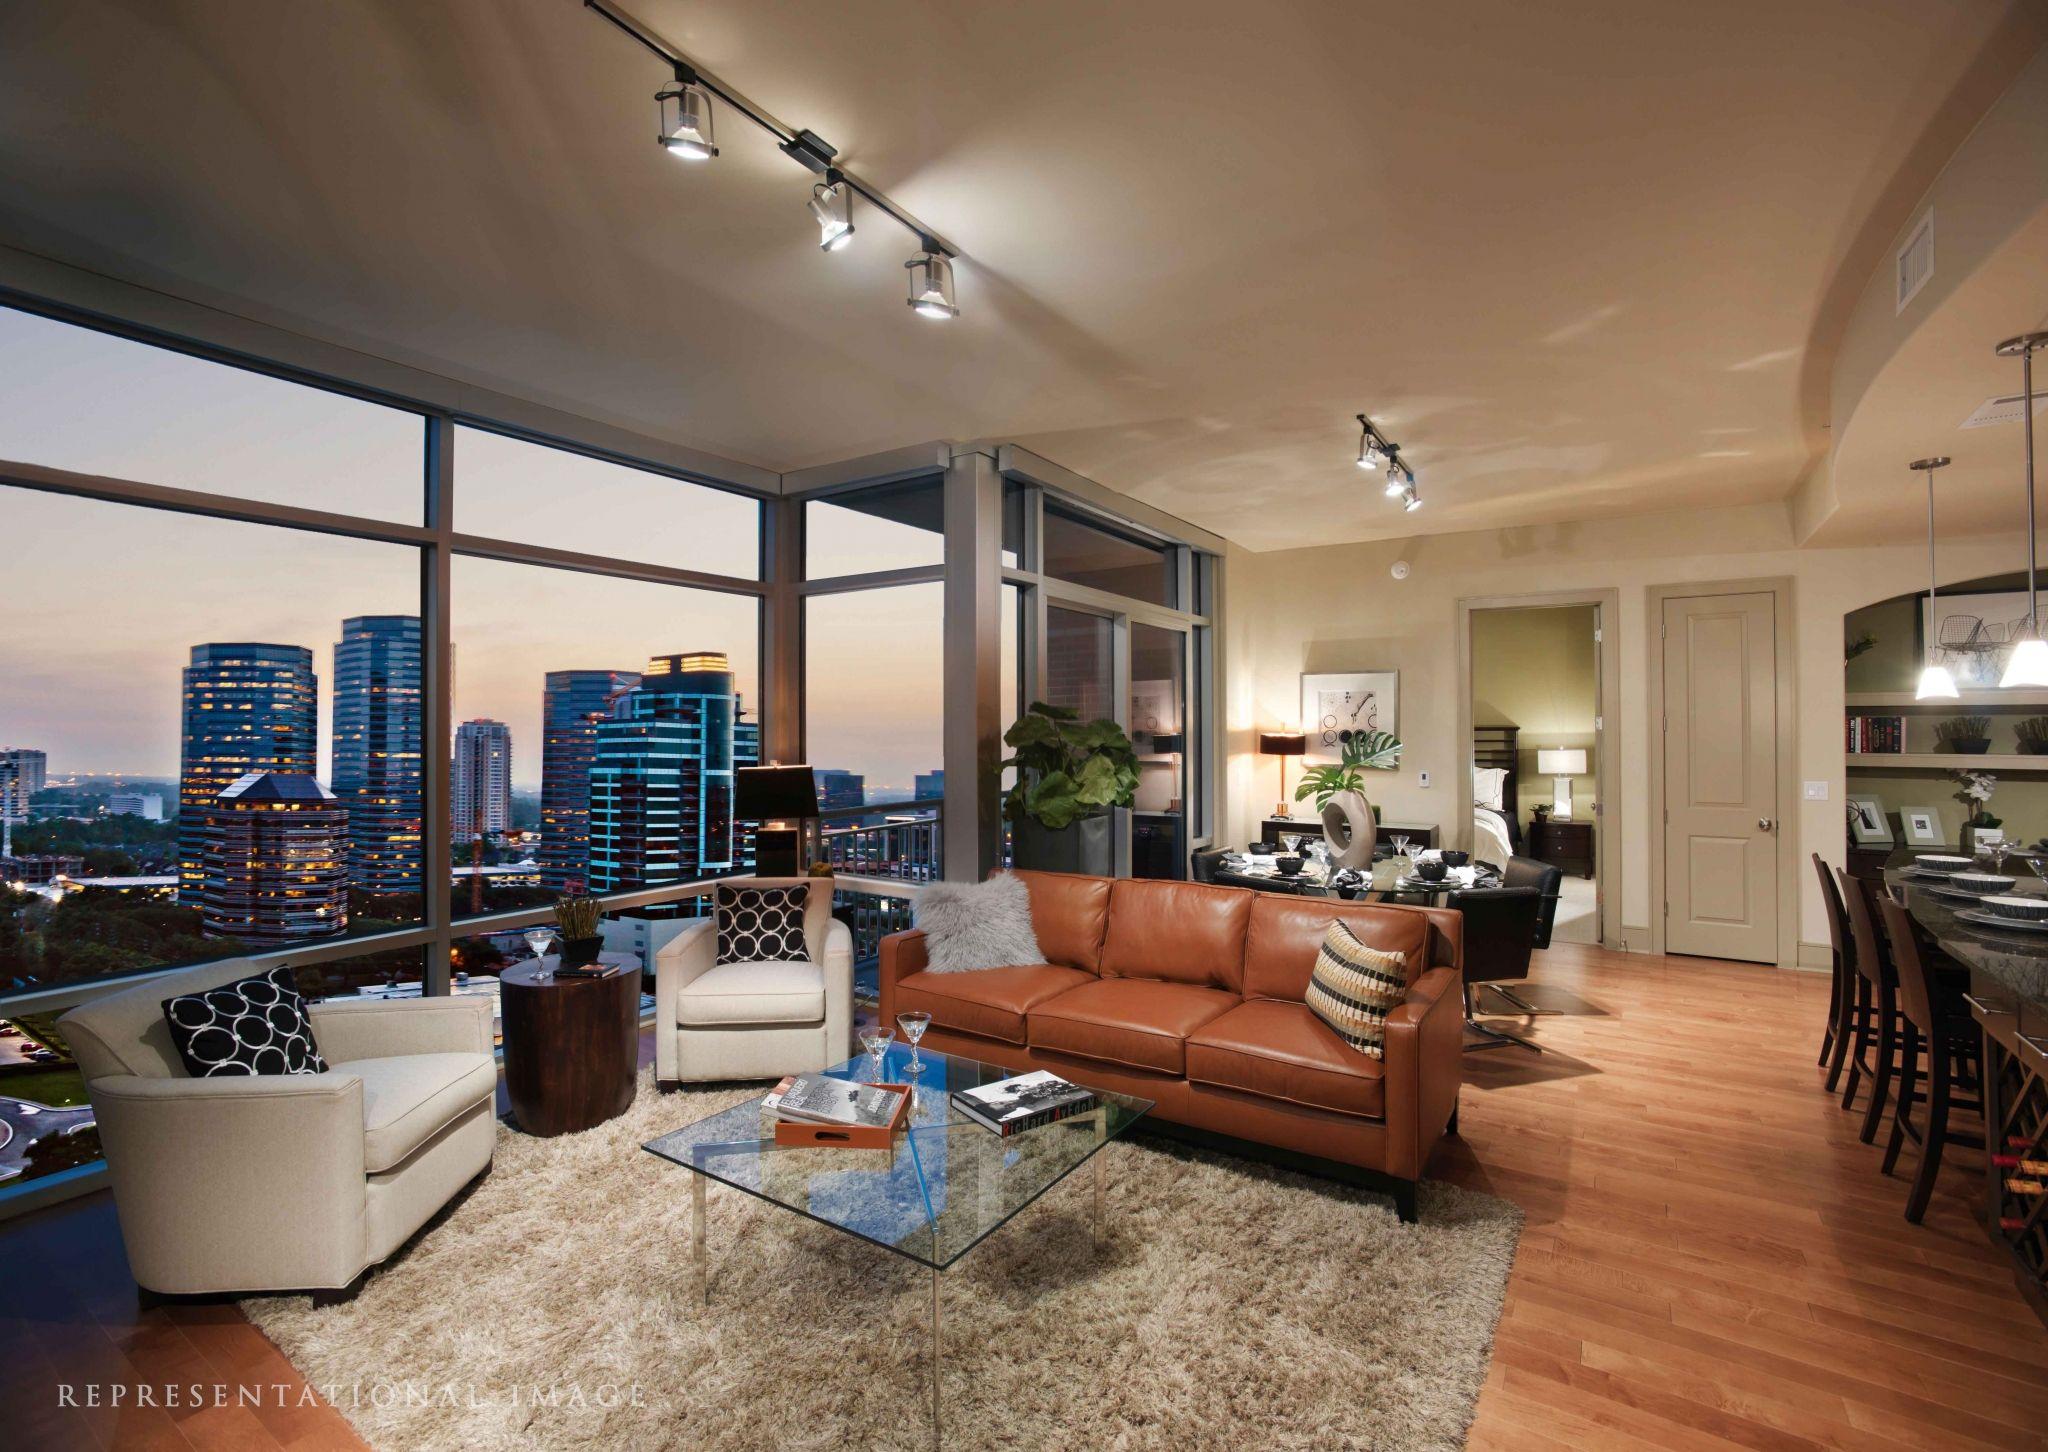 Hanover Post Oak ǀ Gallery ǀ Houston High Rise Apartments High Rise Apartments Apartment View Houston Apartment